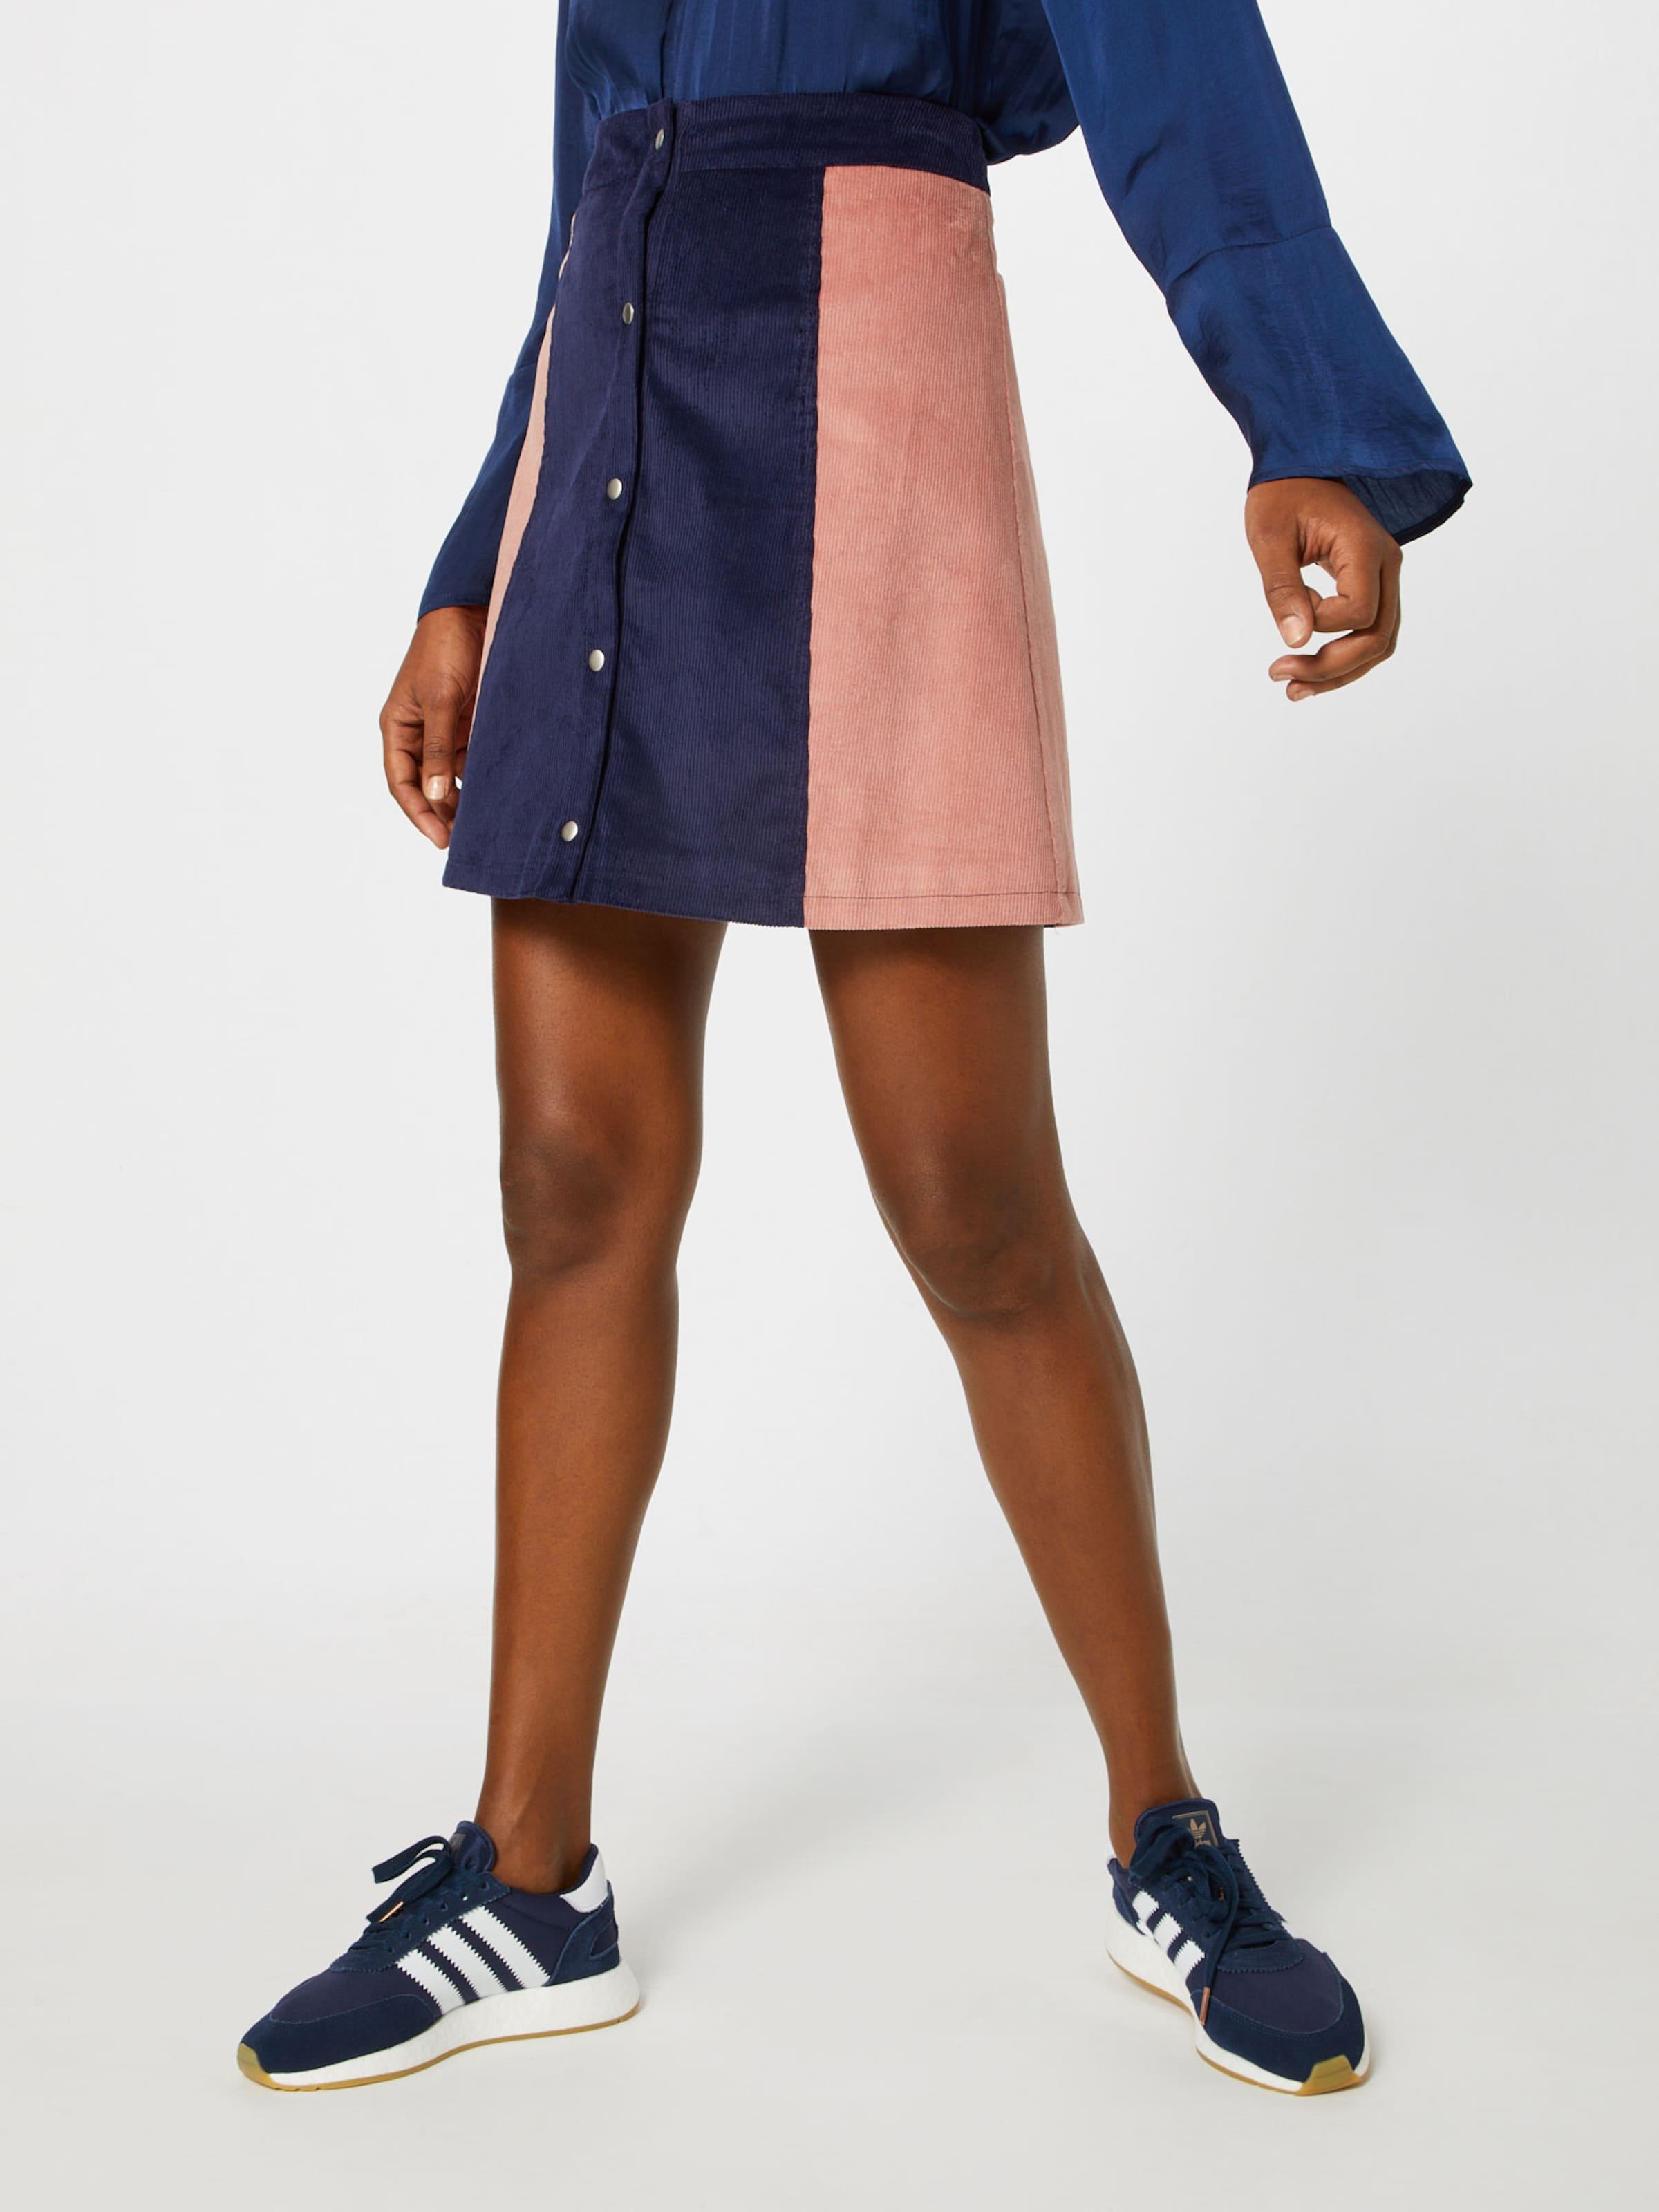 En Glamorous Glamorous Jupe En BleuRose BleuRose Jupe En Jupe Glamorous K3l1JFcT